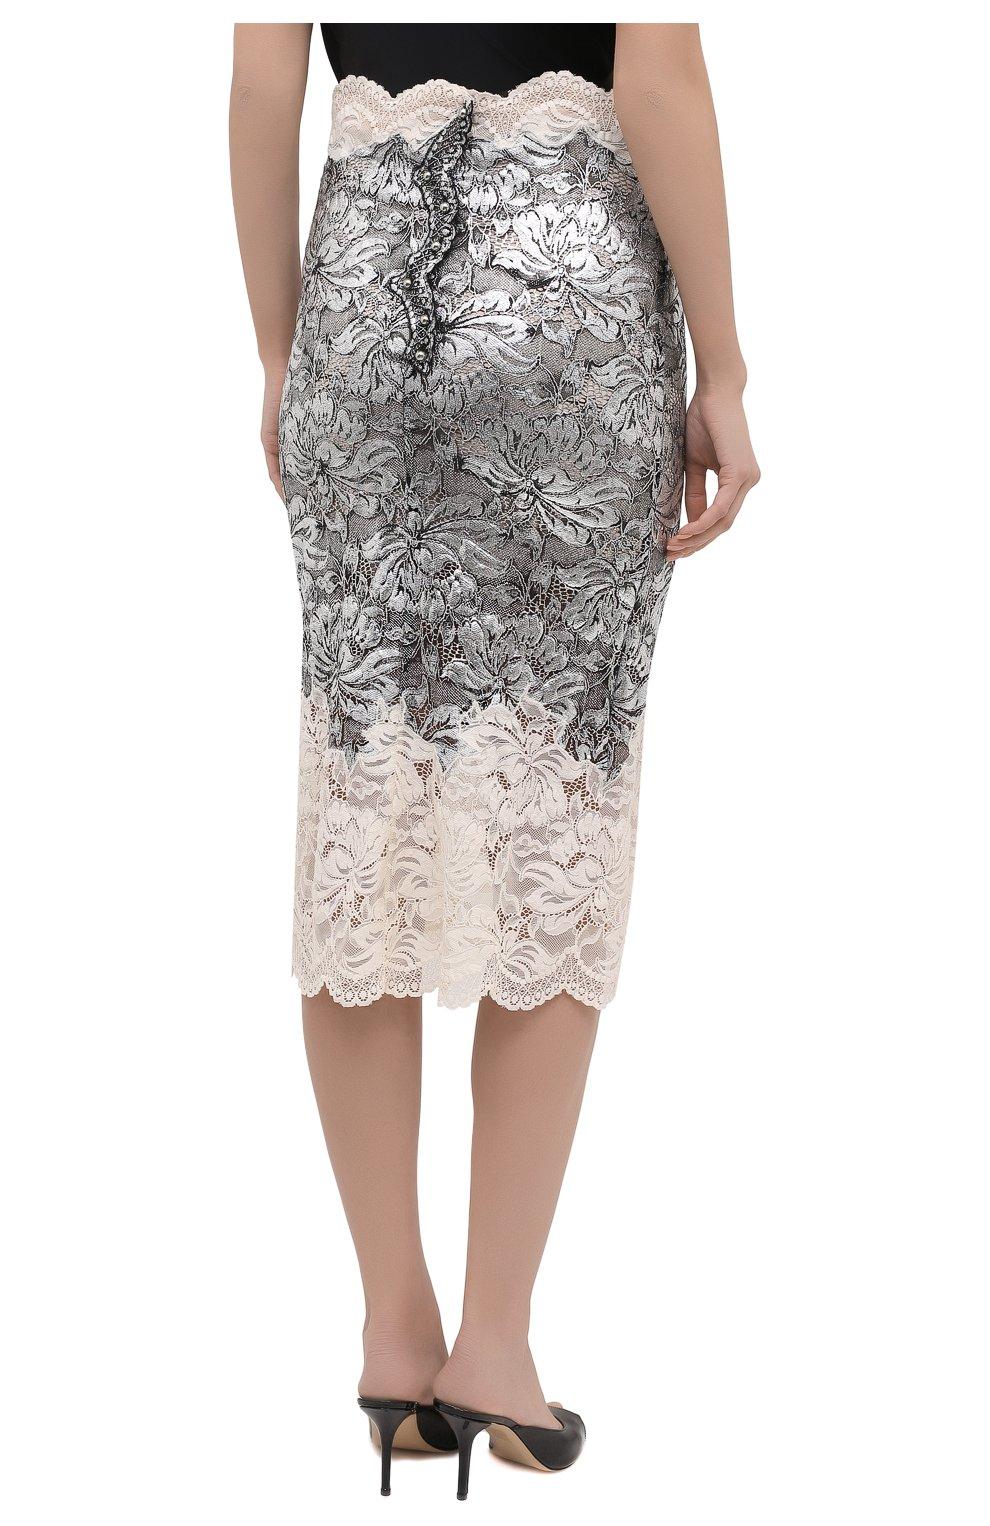 Женская юбка PACO RABANNE серебряного цвета, арт. 21EJJU201PA0173 | Фото 4